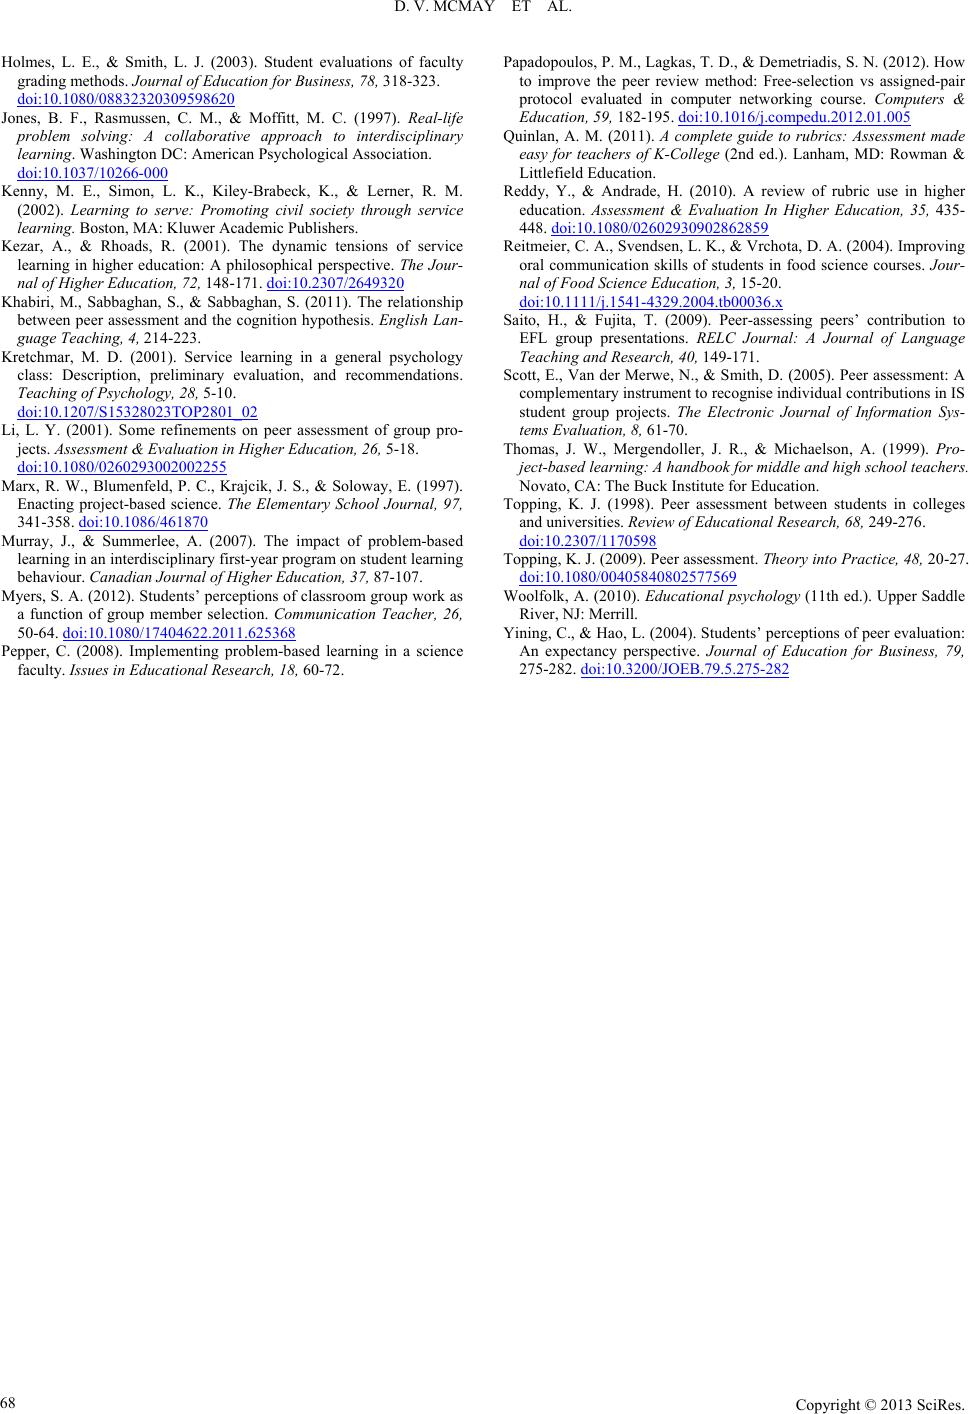 problem based learning journal pdf